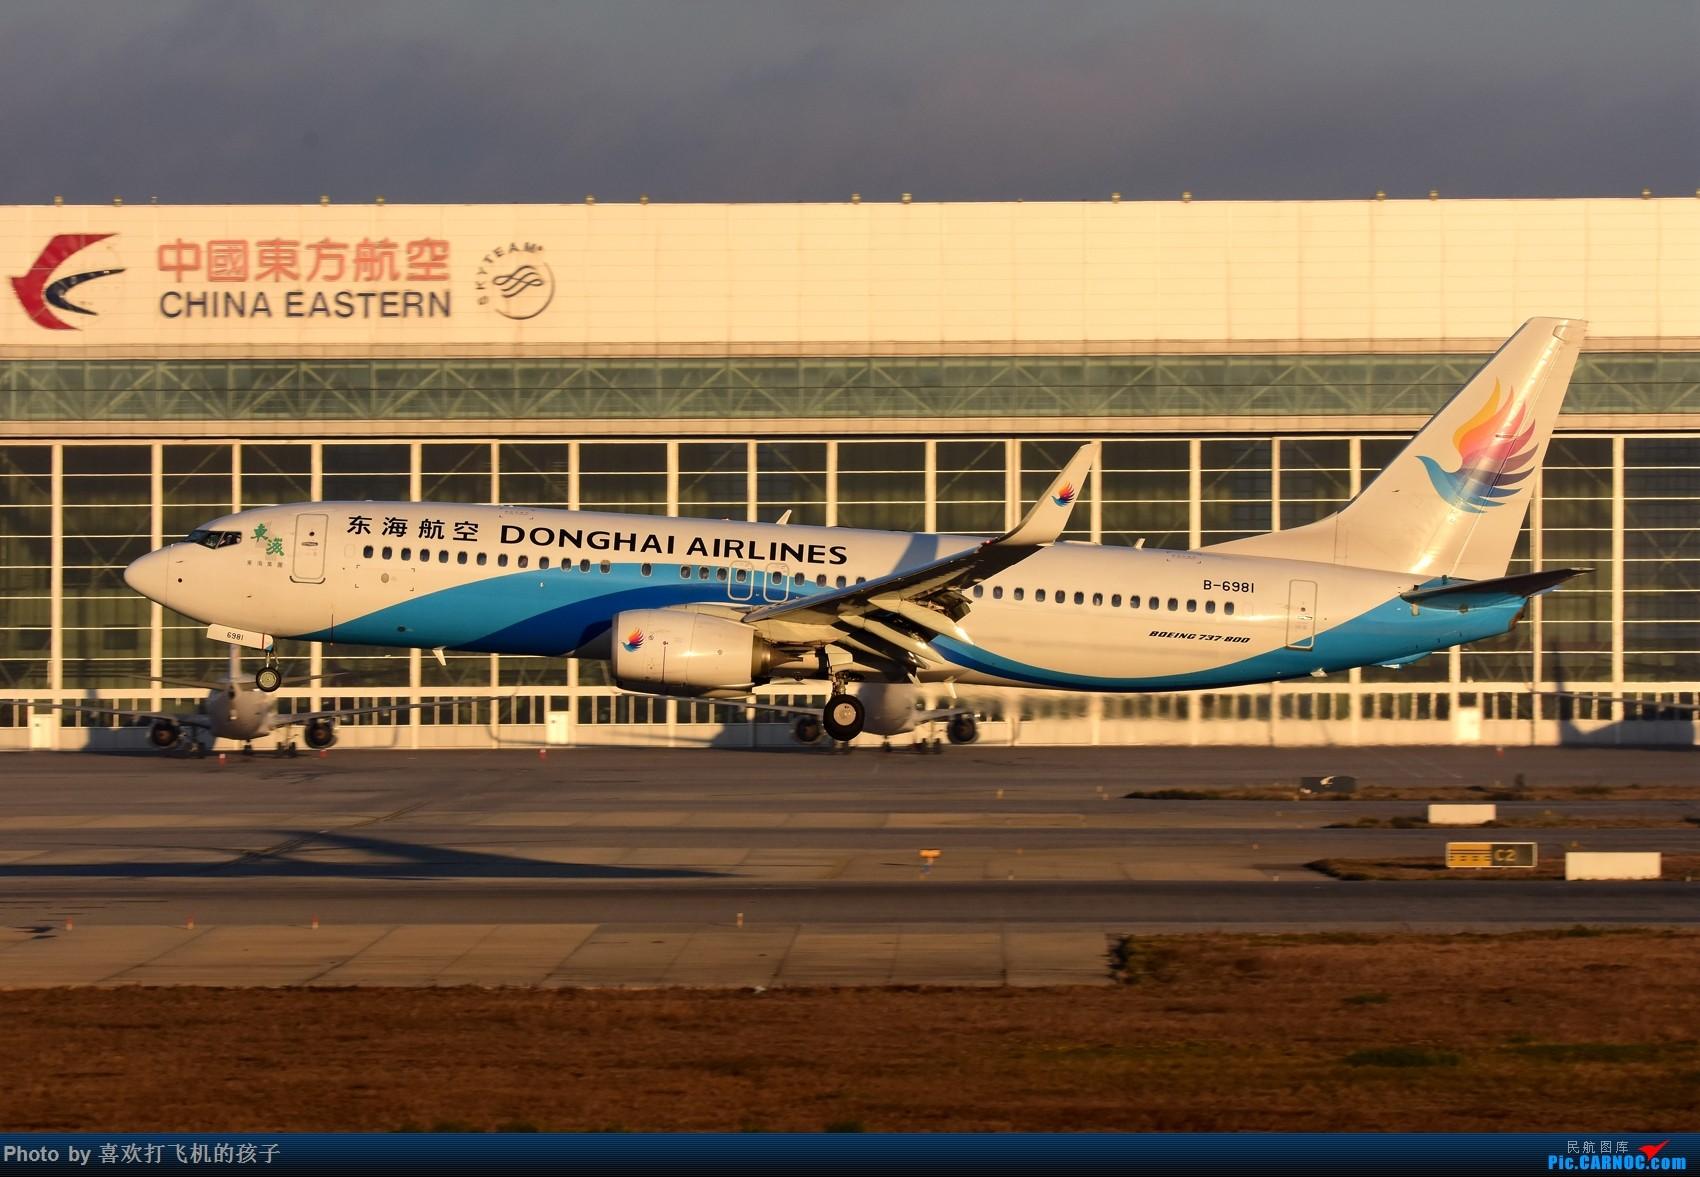 Re:[原创]【机机的飞飞】 KMG昆明长水,年初存货 BOEING 737-800 B-6981 中国昆明长水国际机场